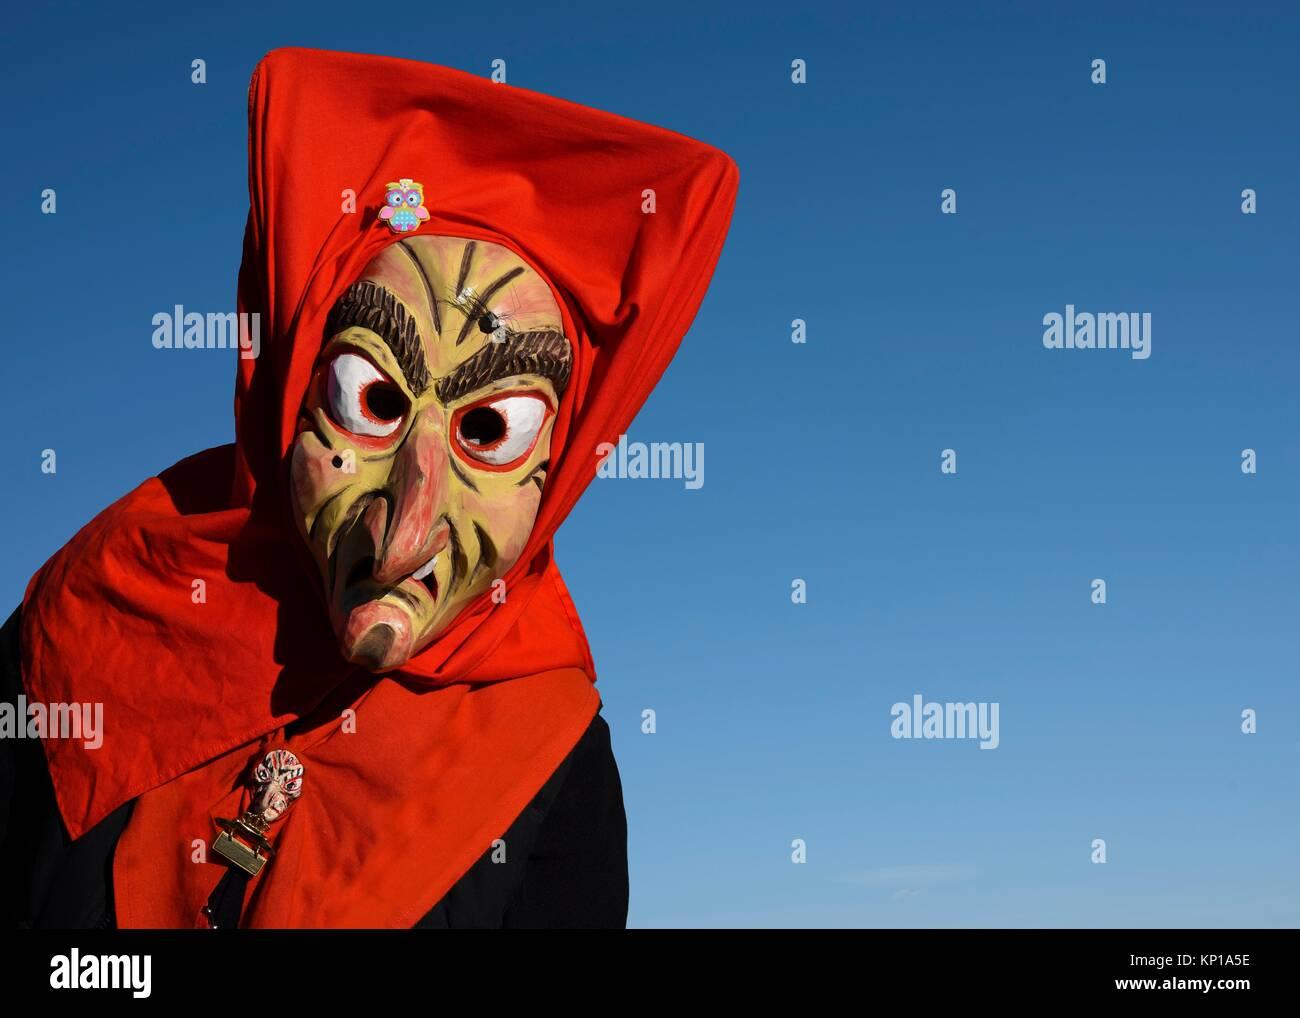 Swabian-Alemannic carnival ´Fasnet´ in South Germany-Germany, Europe. - Stock Image